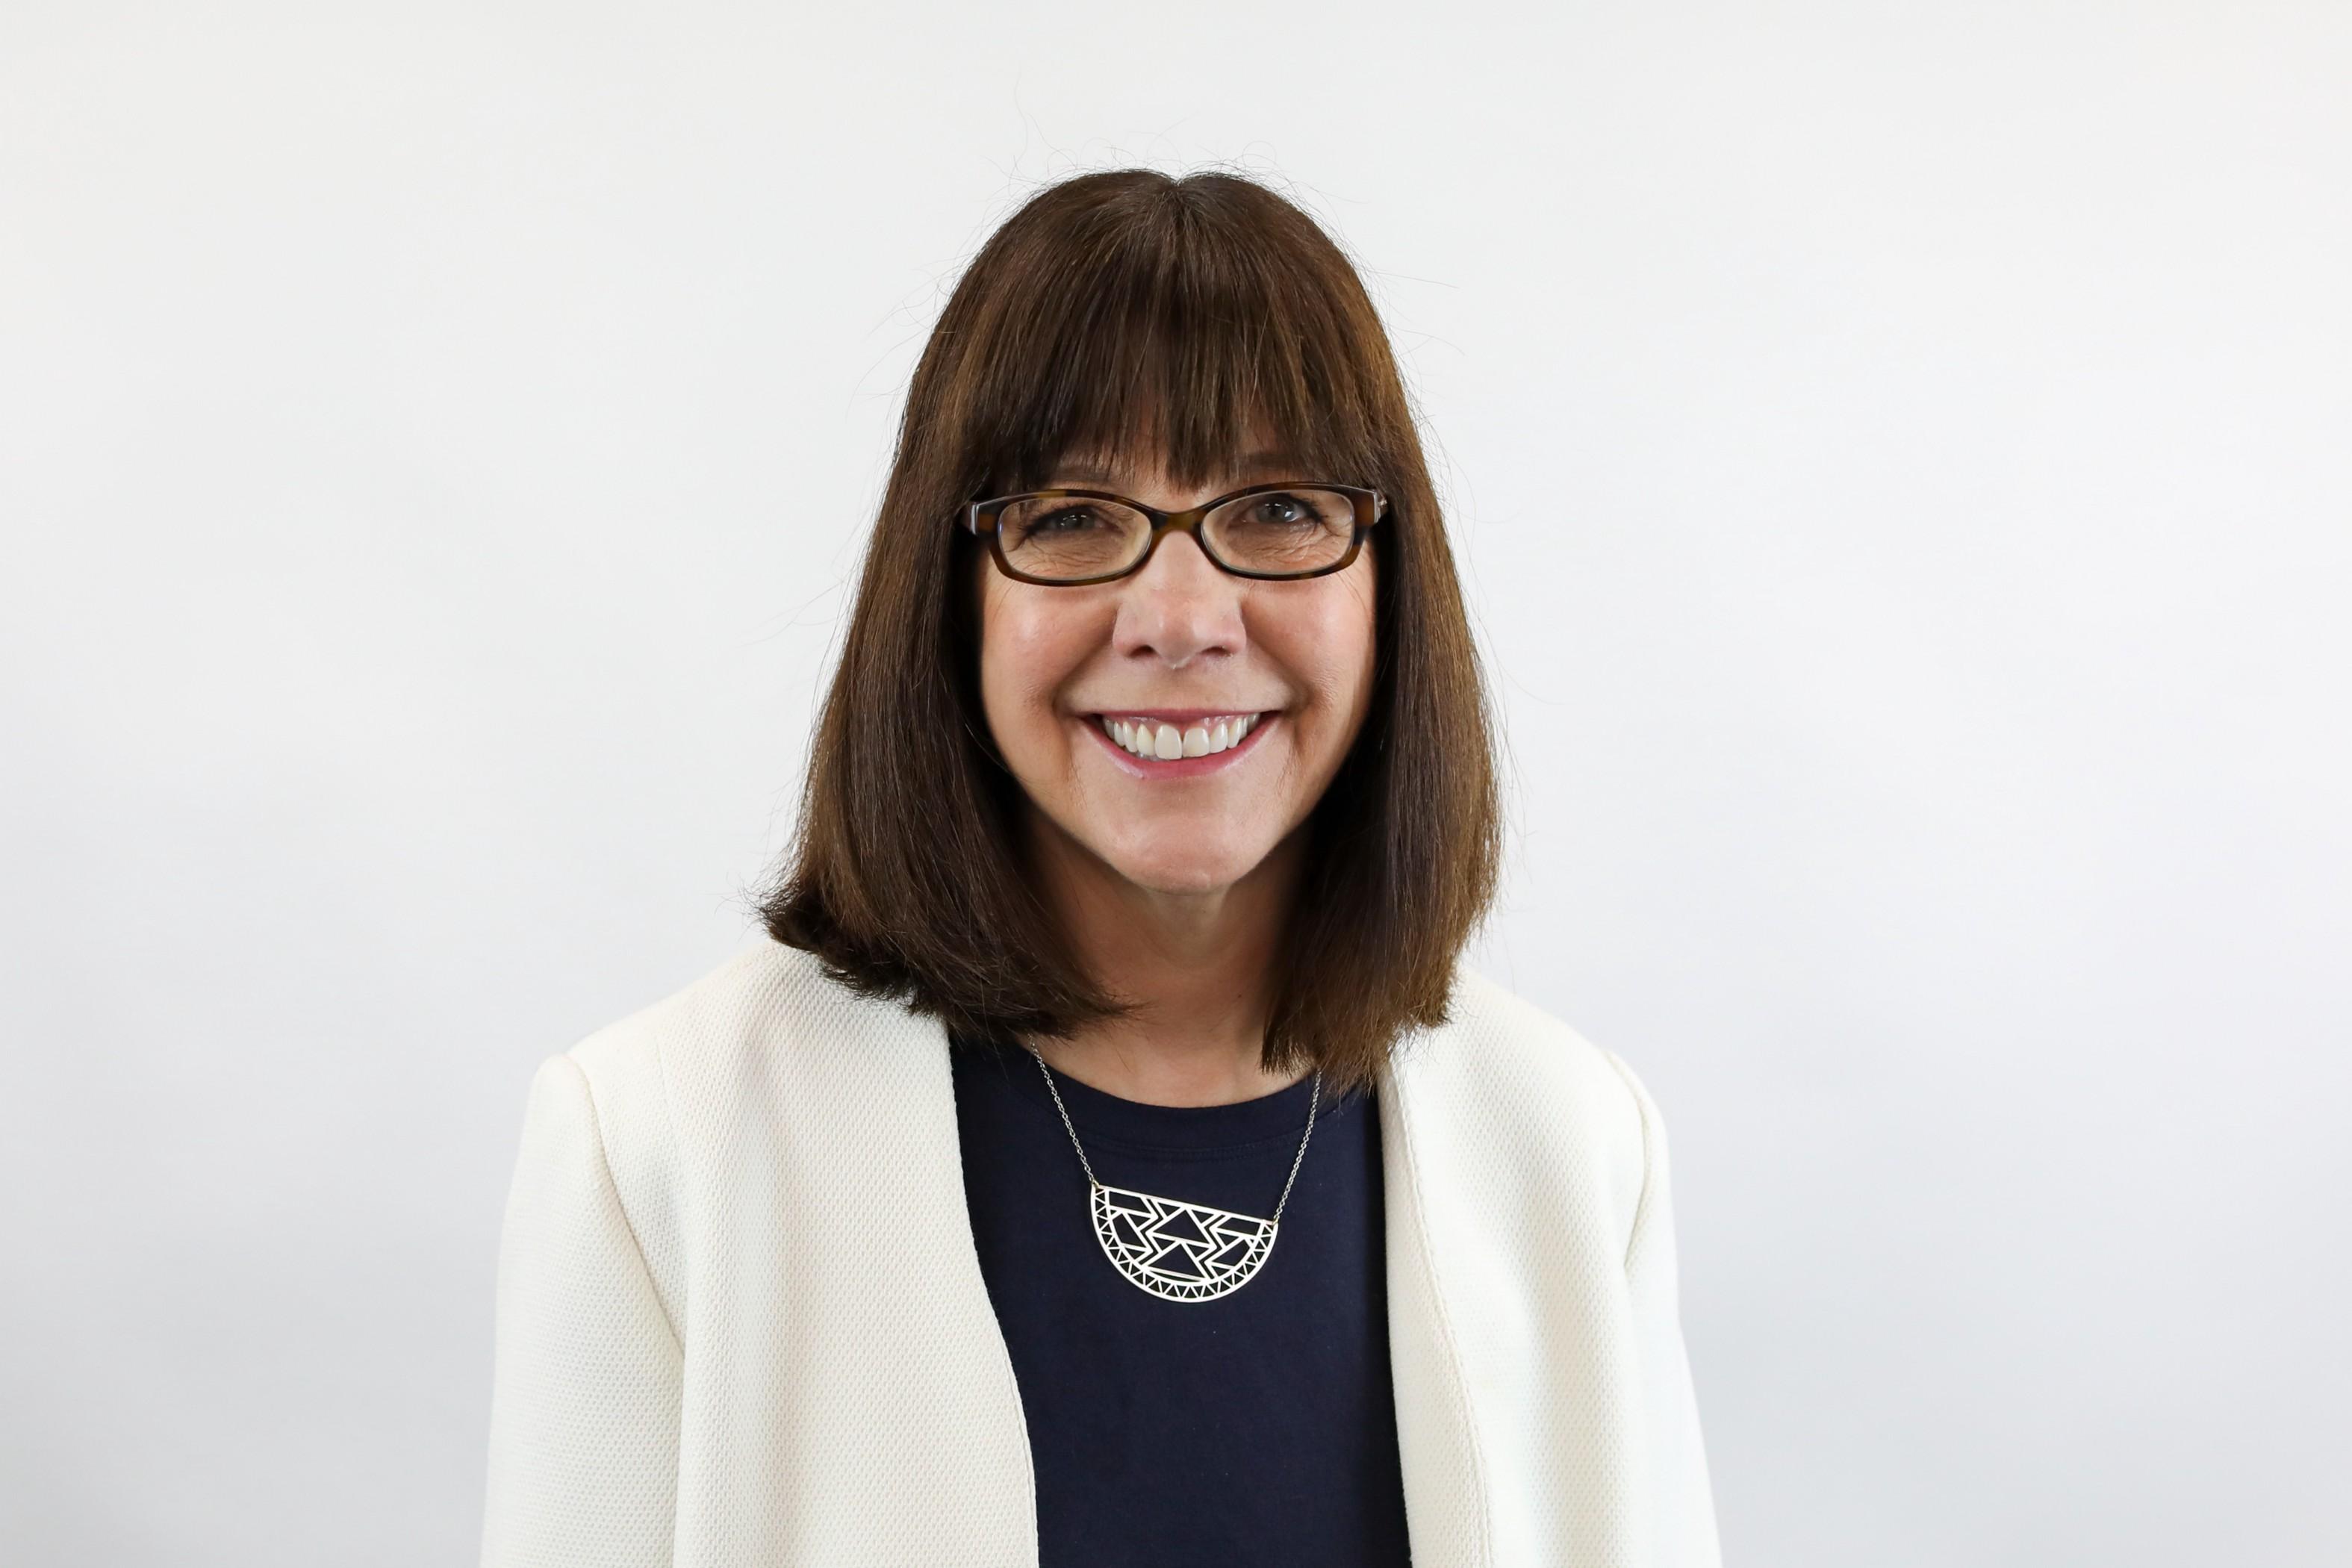 Karen Scates